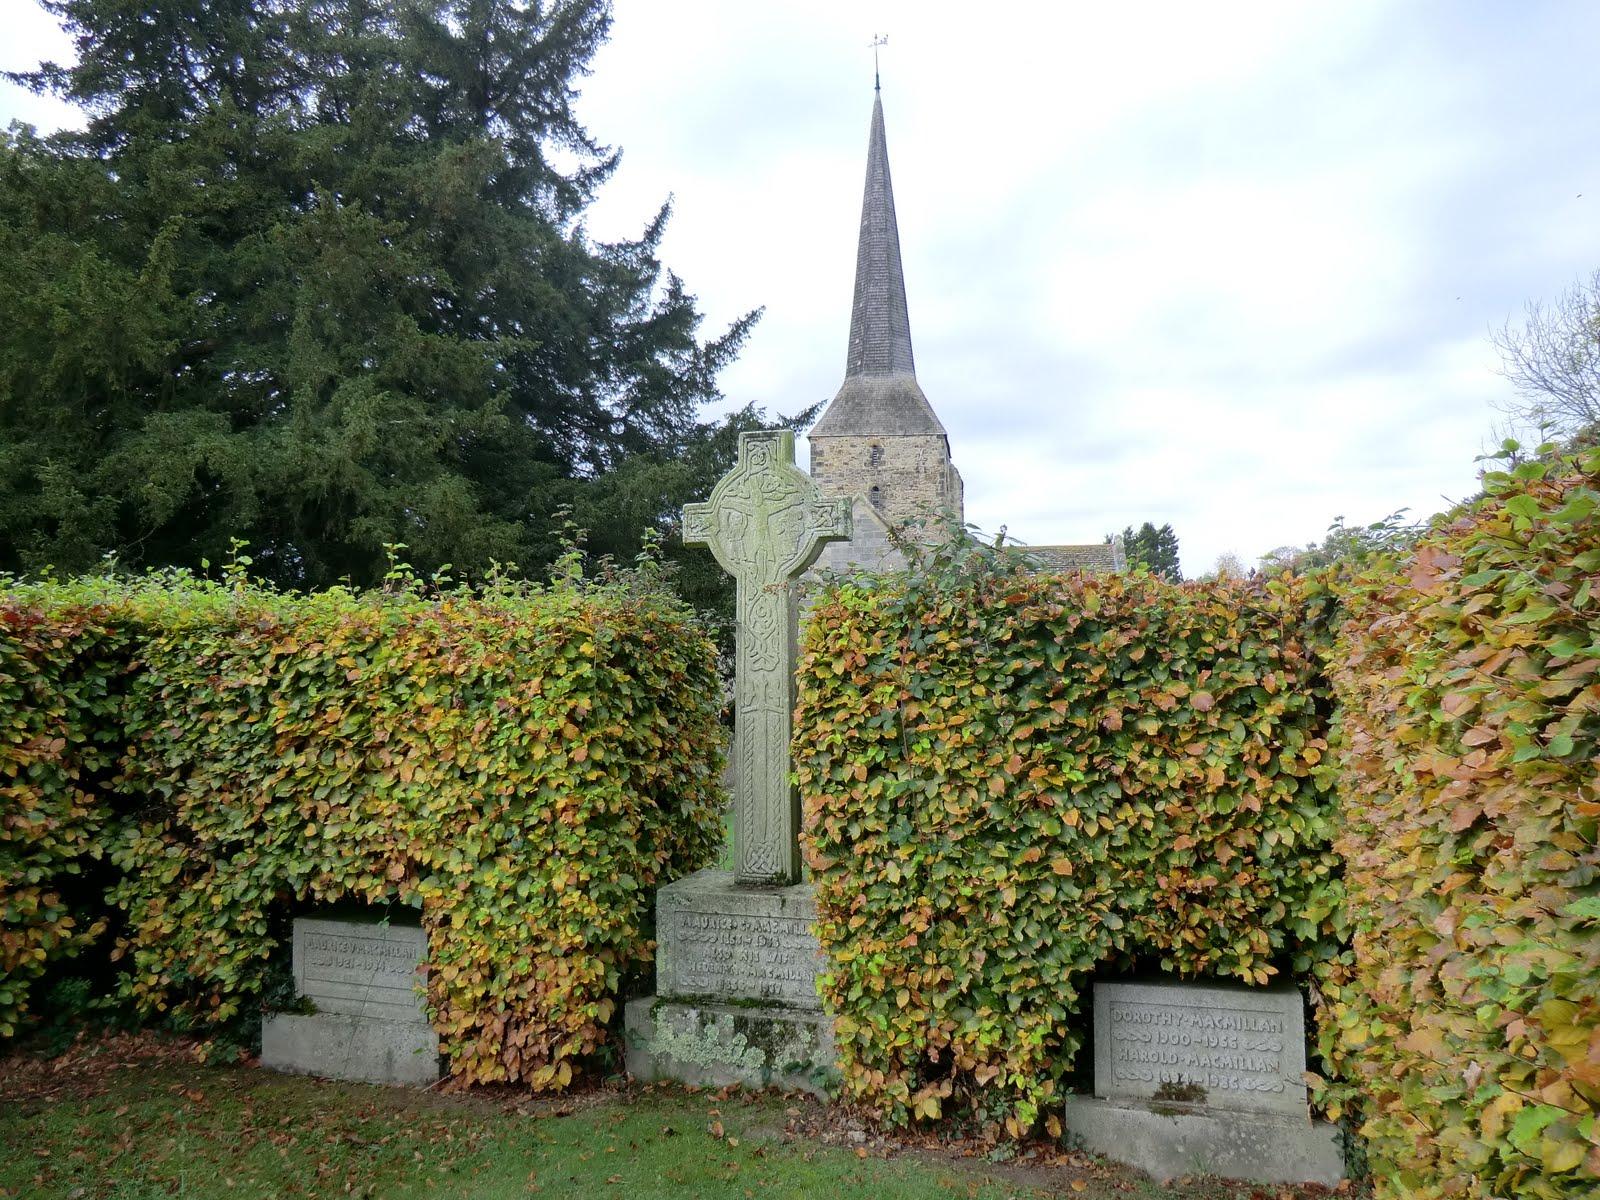 CIMG0178 MacMillan memorial, St Giles churchyard